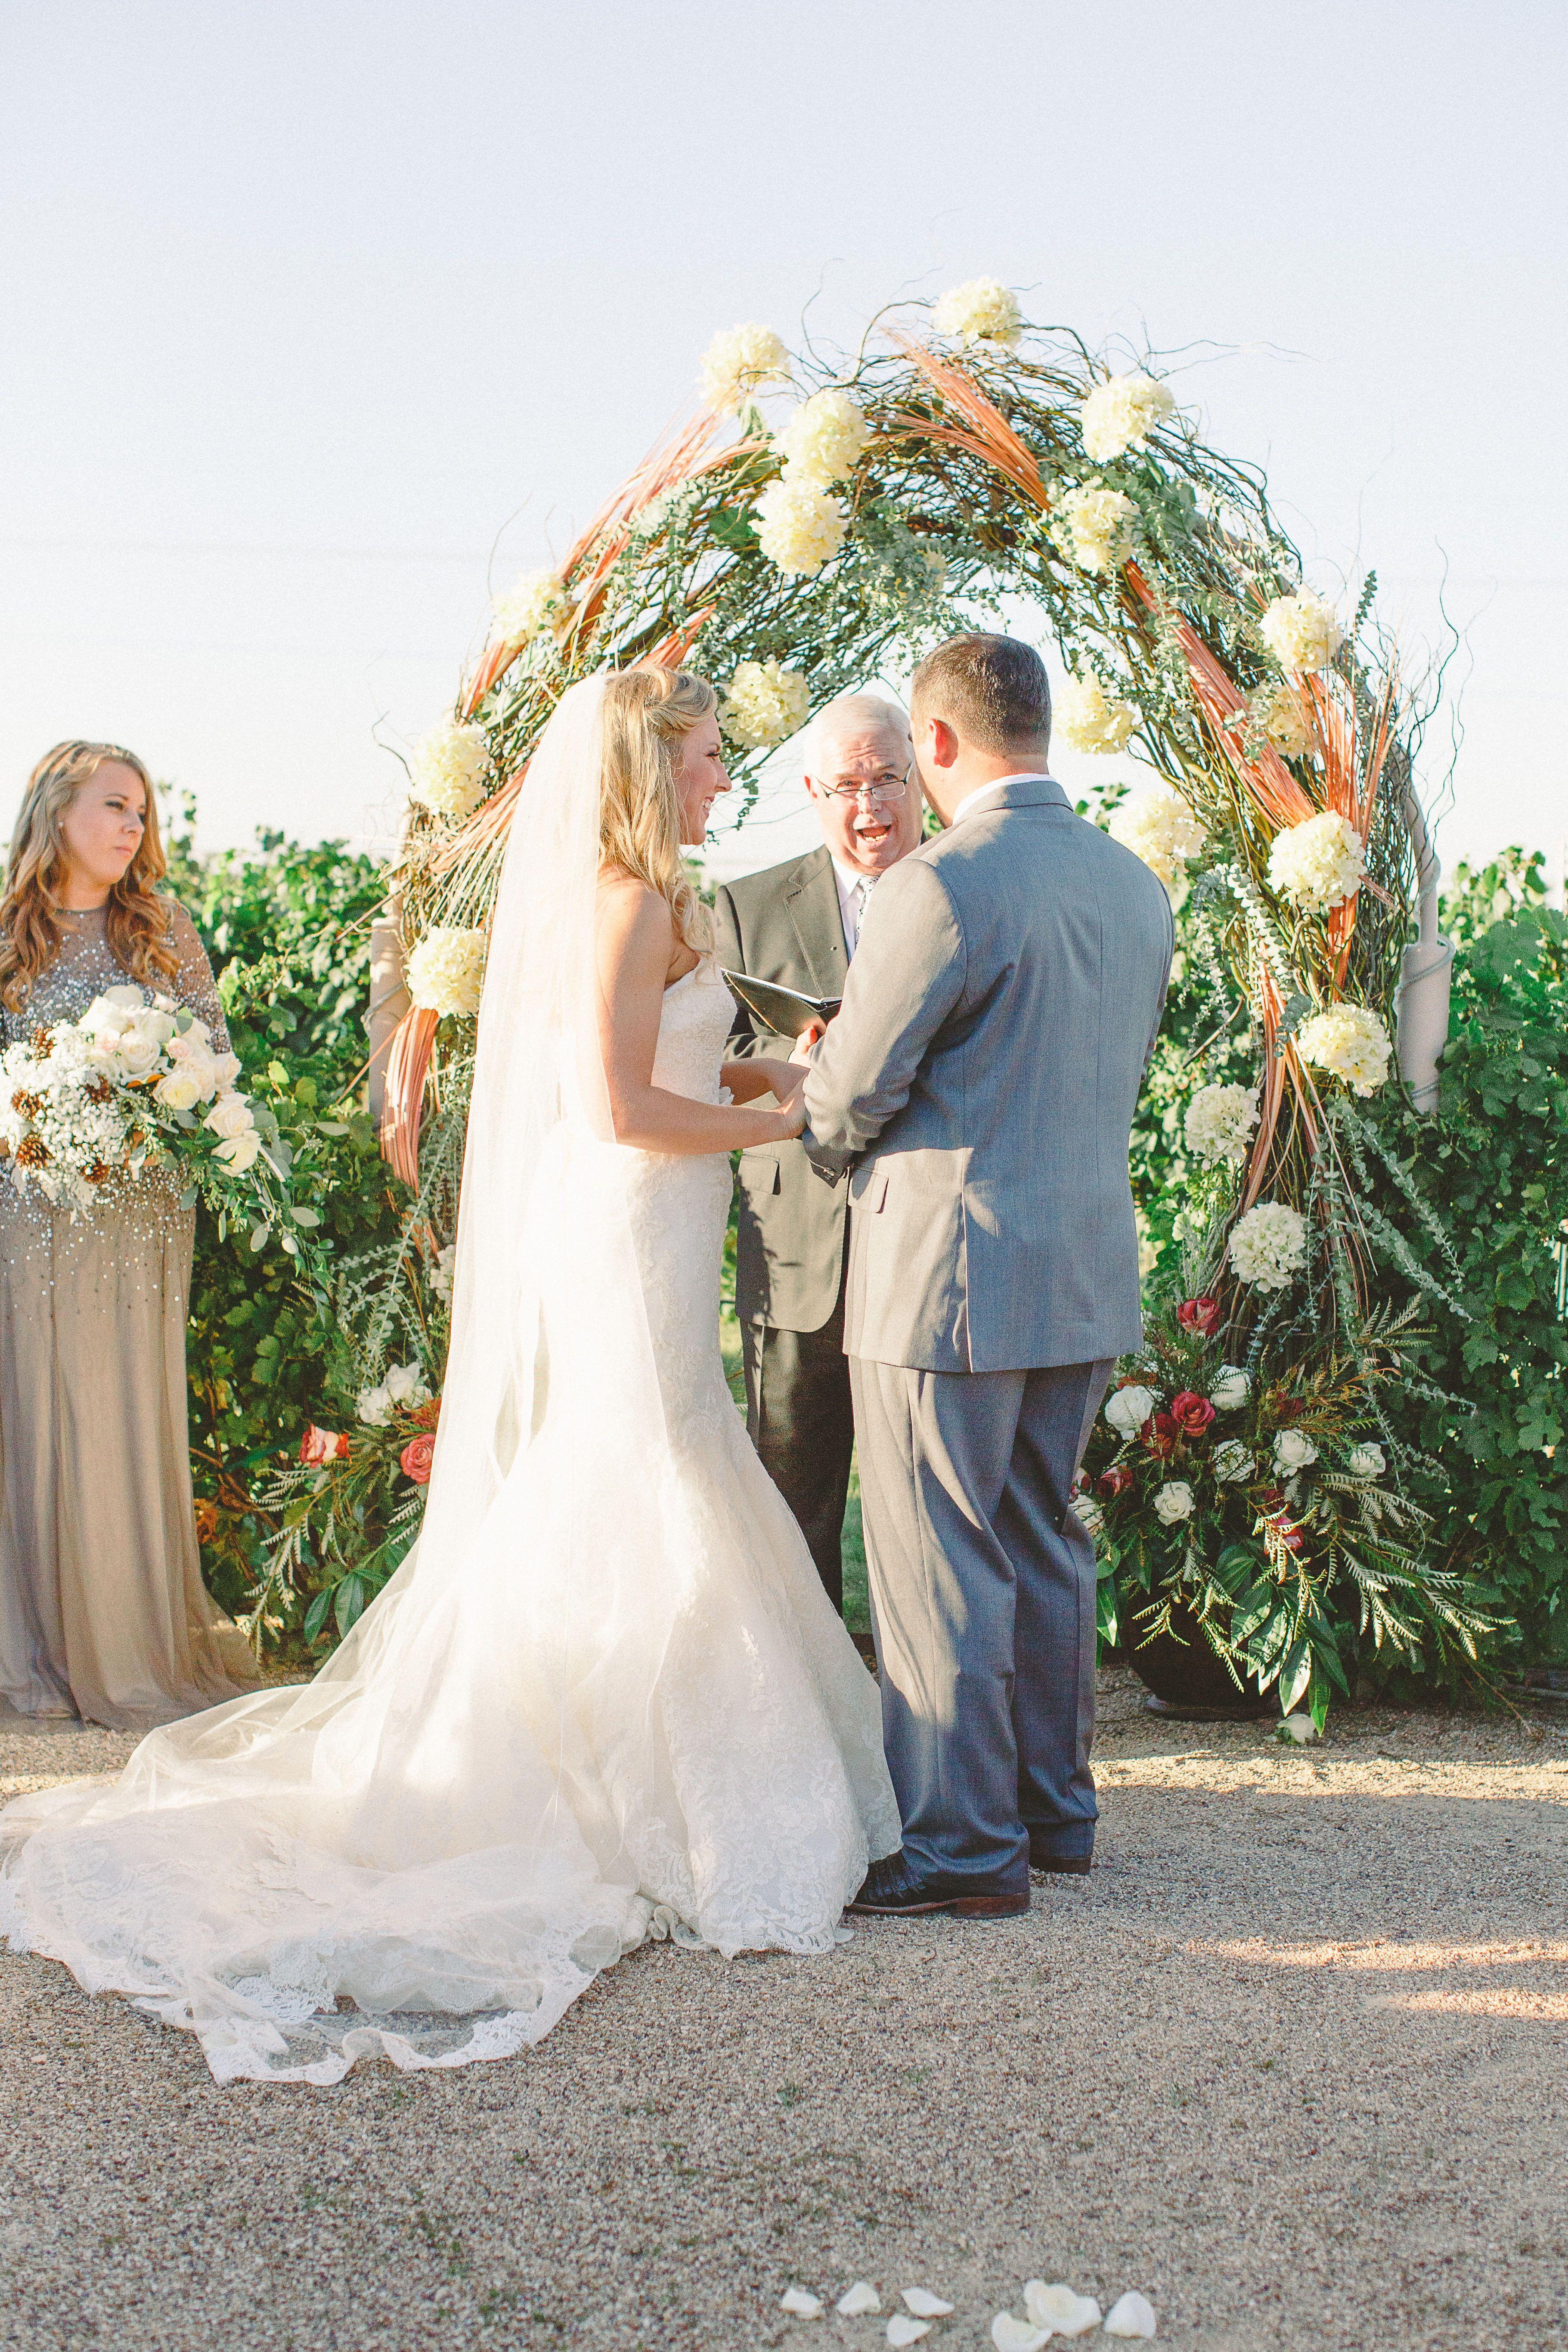 Round Natural Hydrangea And Branch Wedding Arch